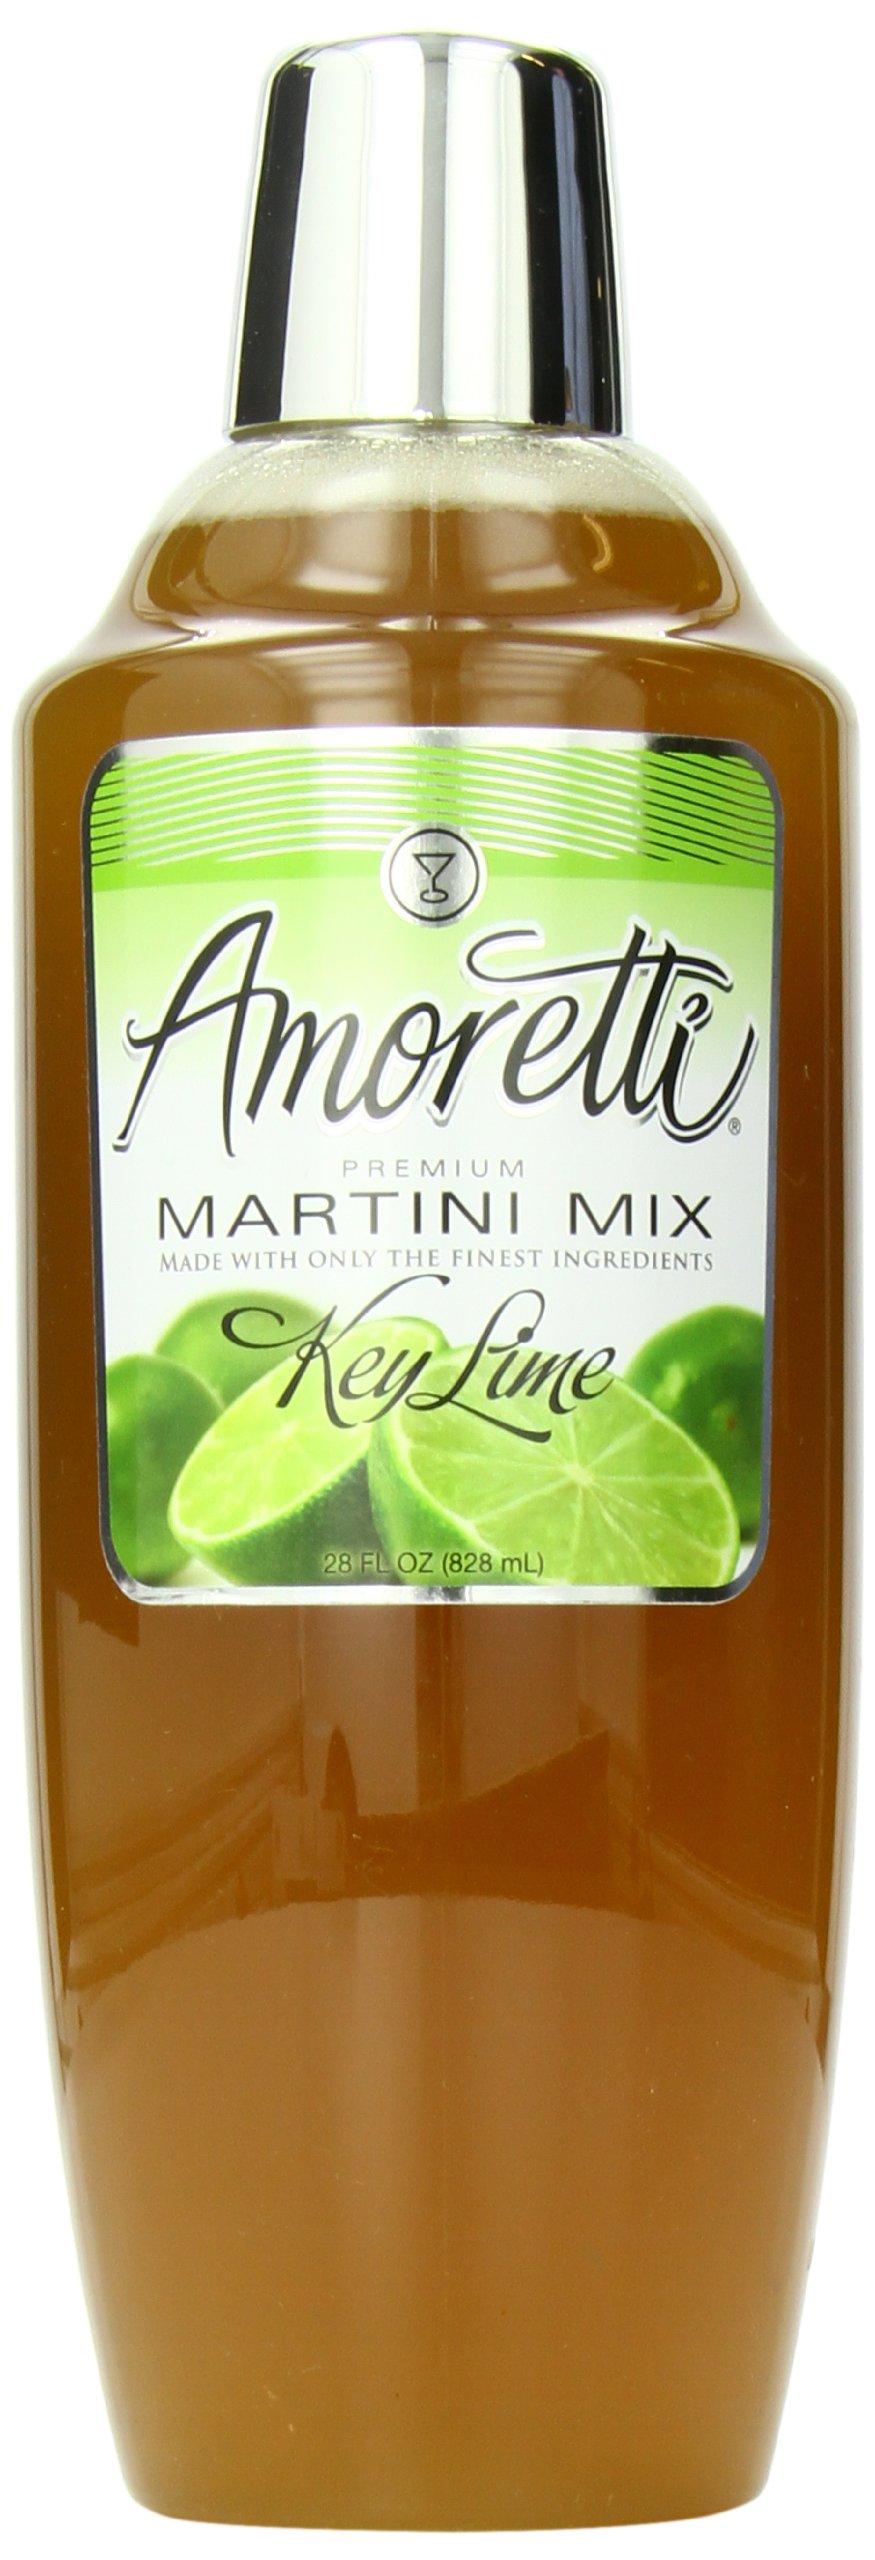 Amoretti Premium Martini Cocktail Mix, Key Lime, 28 Ounce by Amoretti